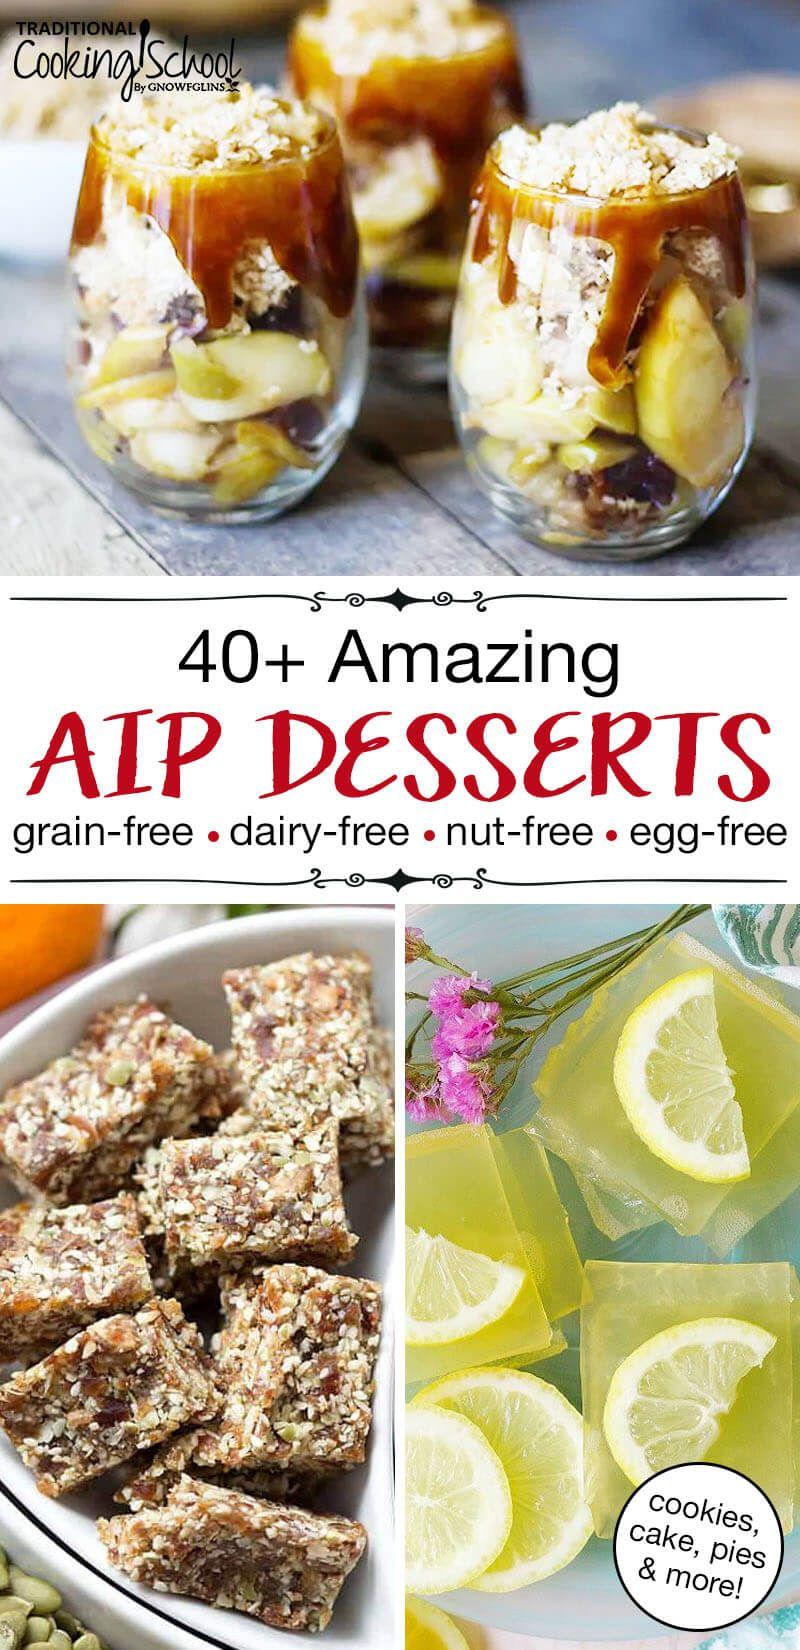 40+ Amazing AIP Desserts (Grain-Free, Dairy-Free, Egg-Free)